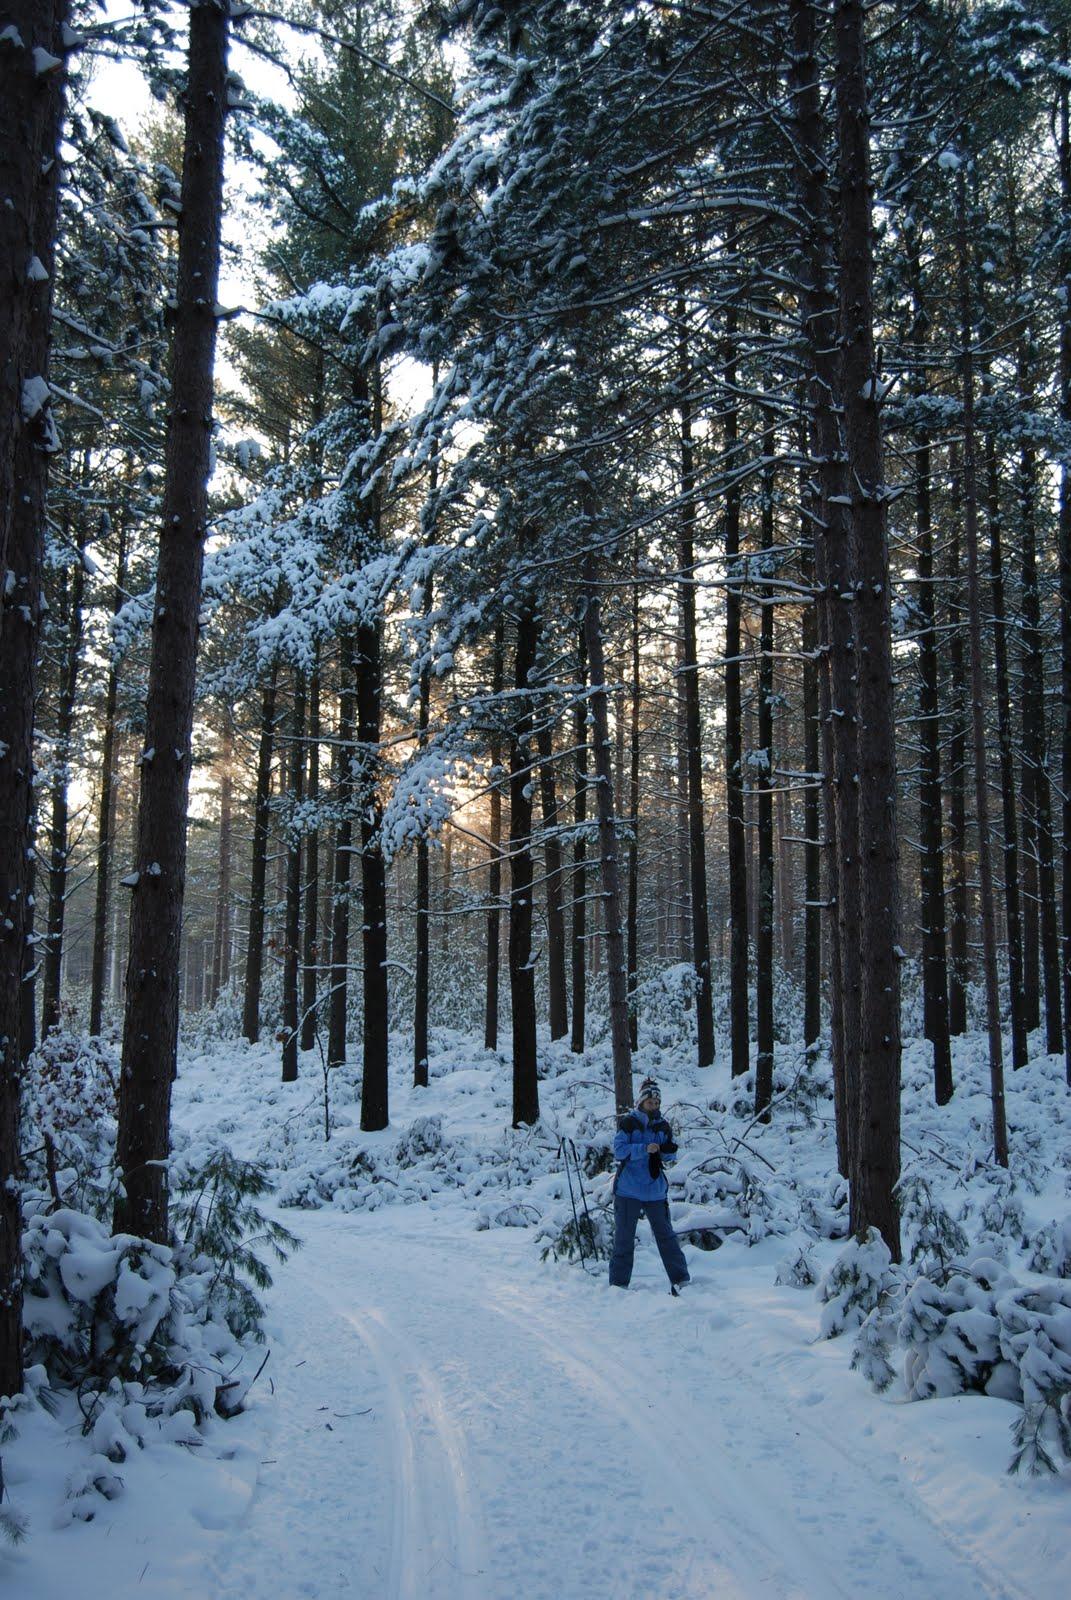 Plover River Ski Trails. Photo by Jim Buchholz